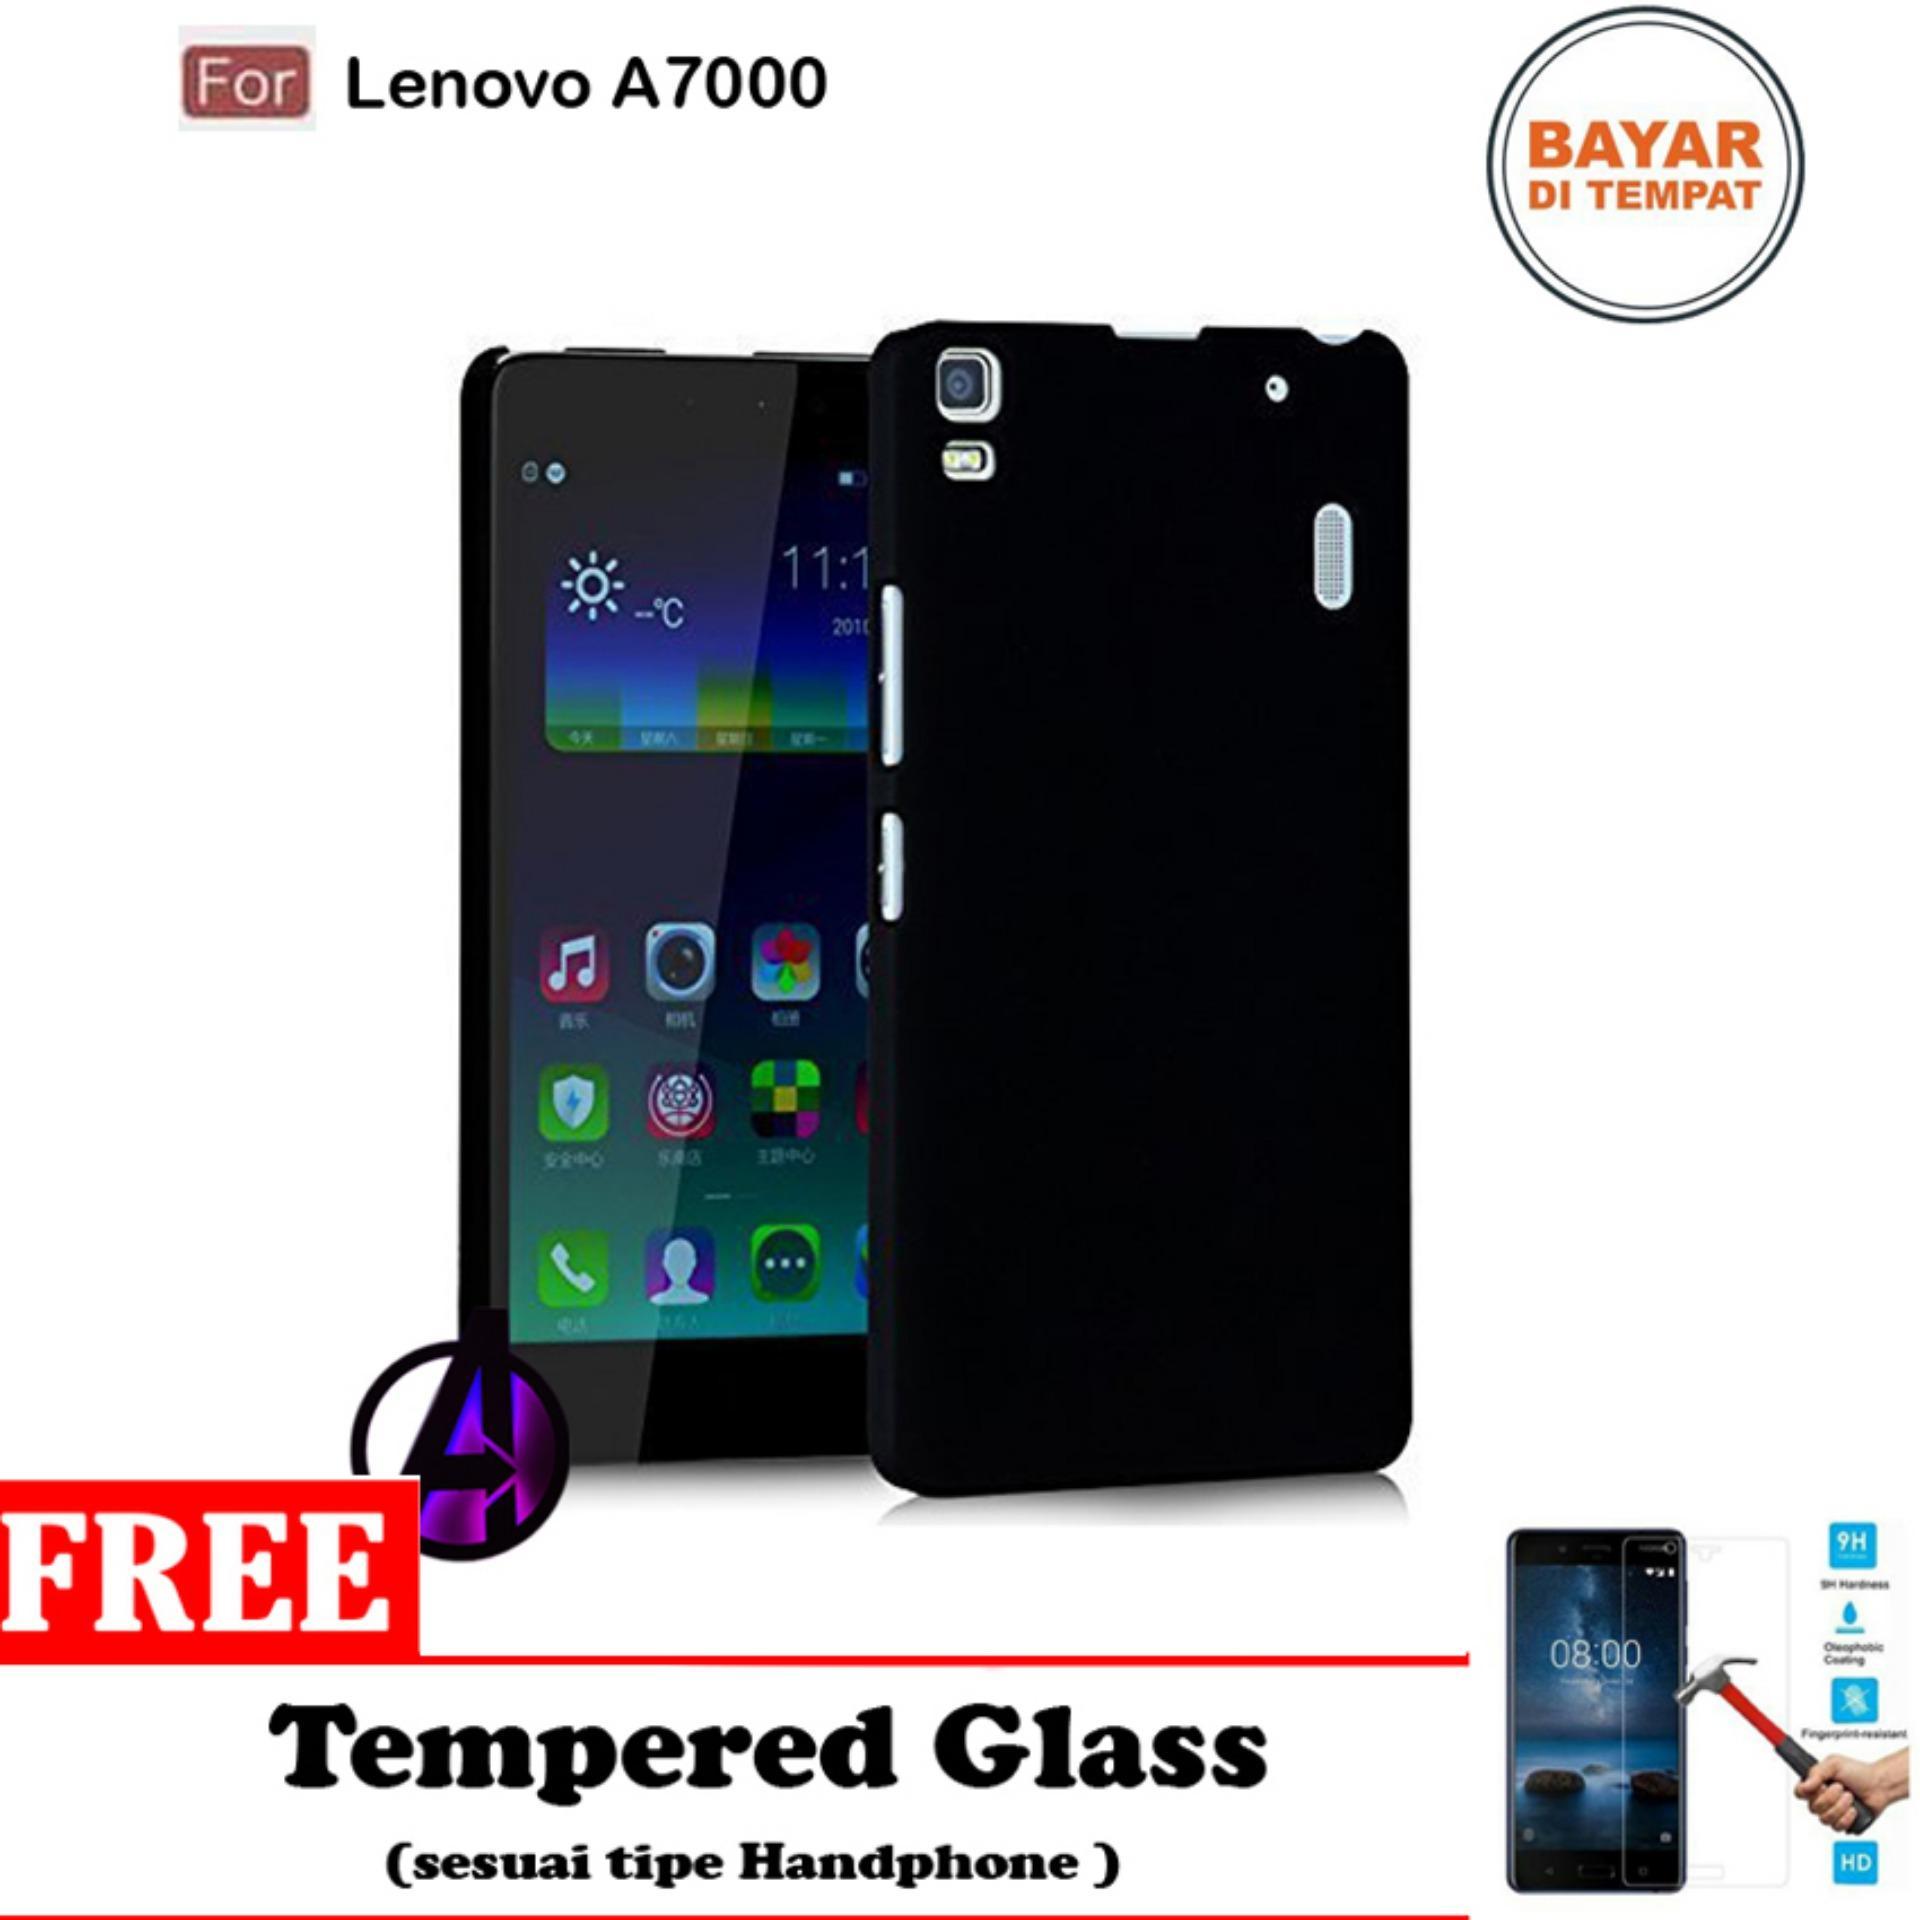 Case Matte Black Soft Slim Casing Handphone Lenovo A7000 Free Tempered Glass